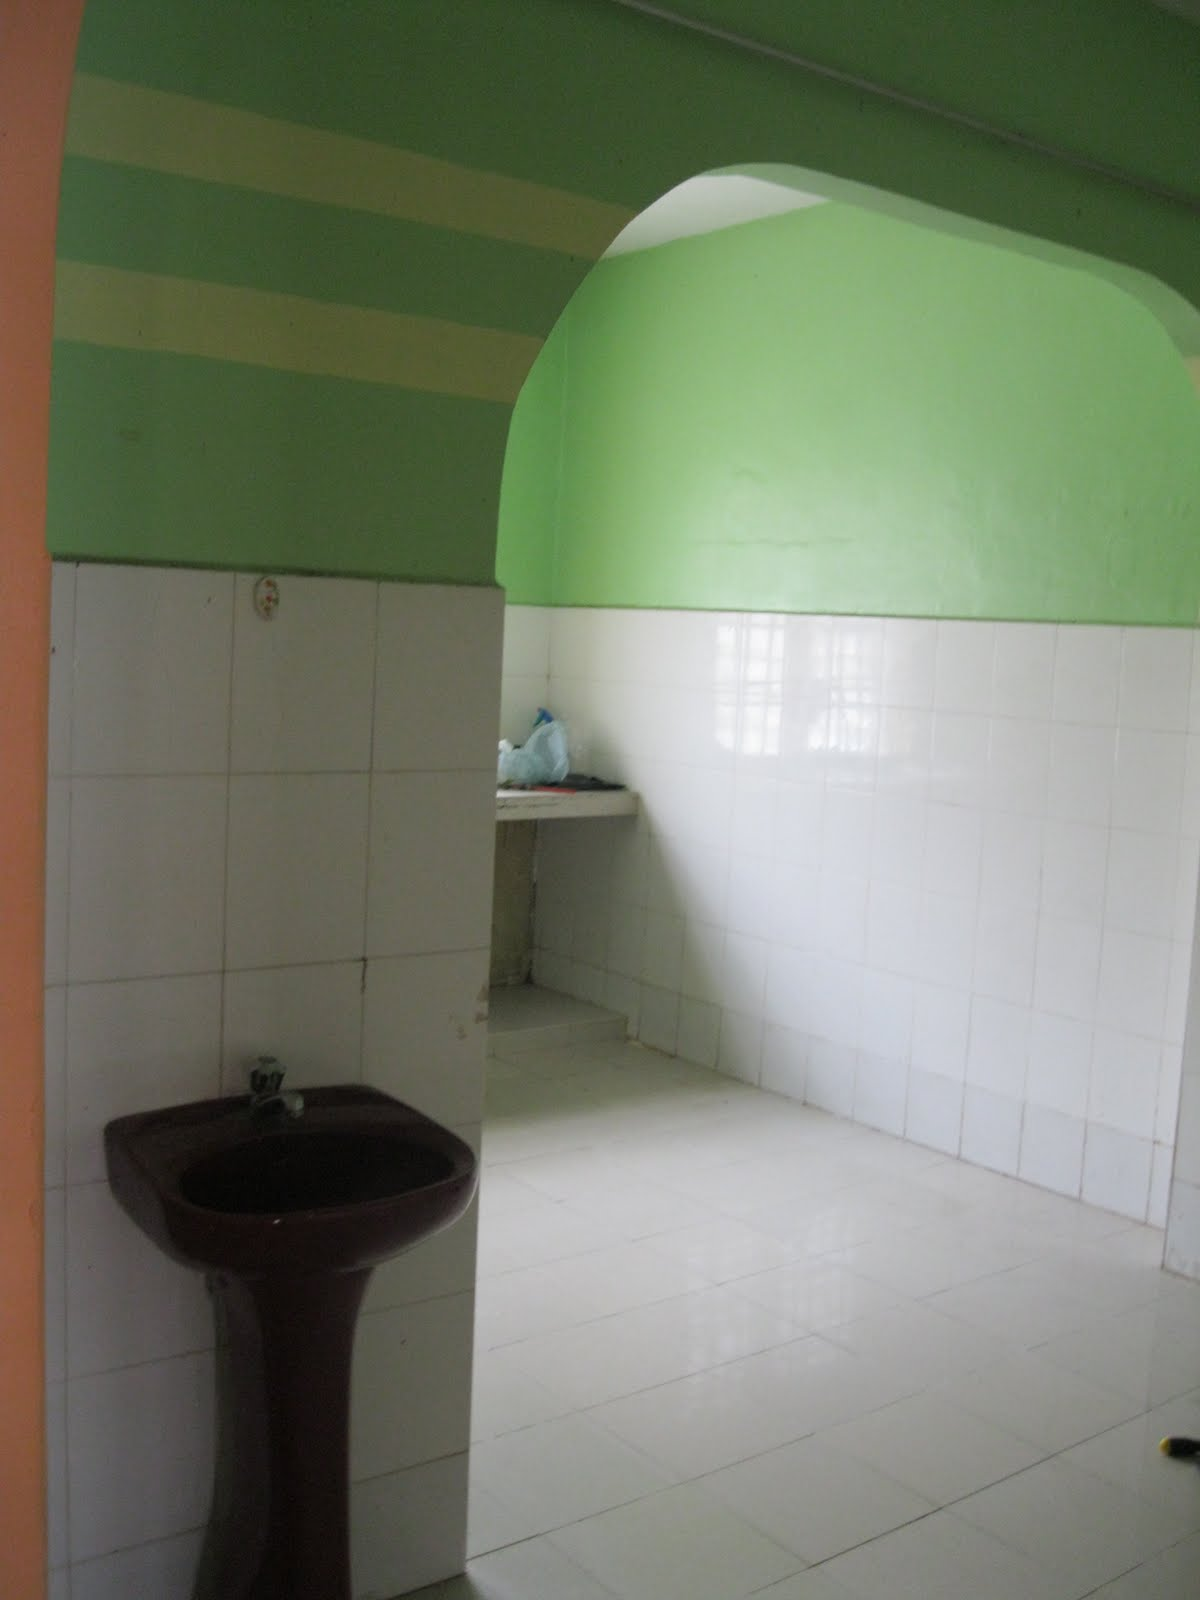 Ni Pintu Gerbang Nak Ke Ruang Makan Dan Dapur Ada Sinki Da Masuk Area